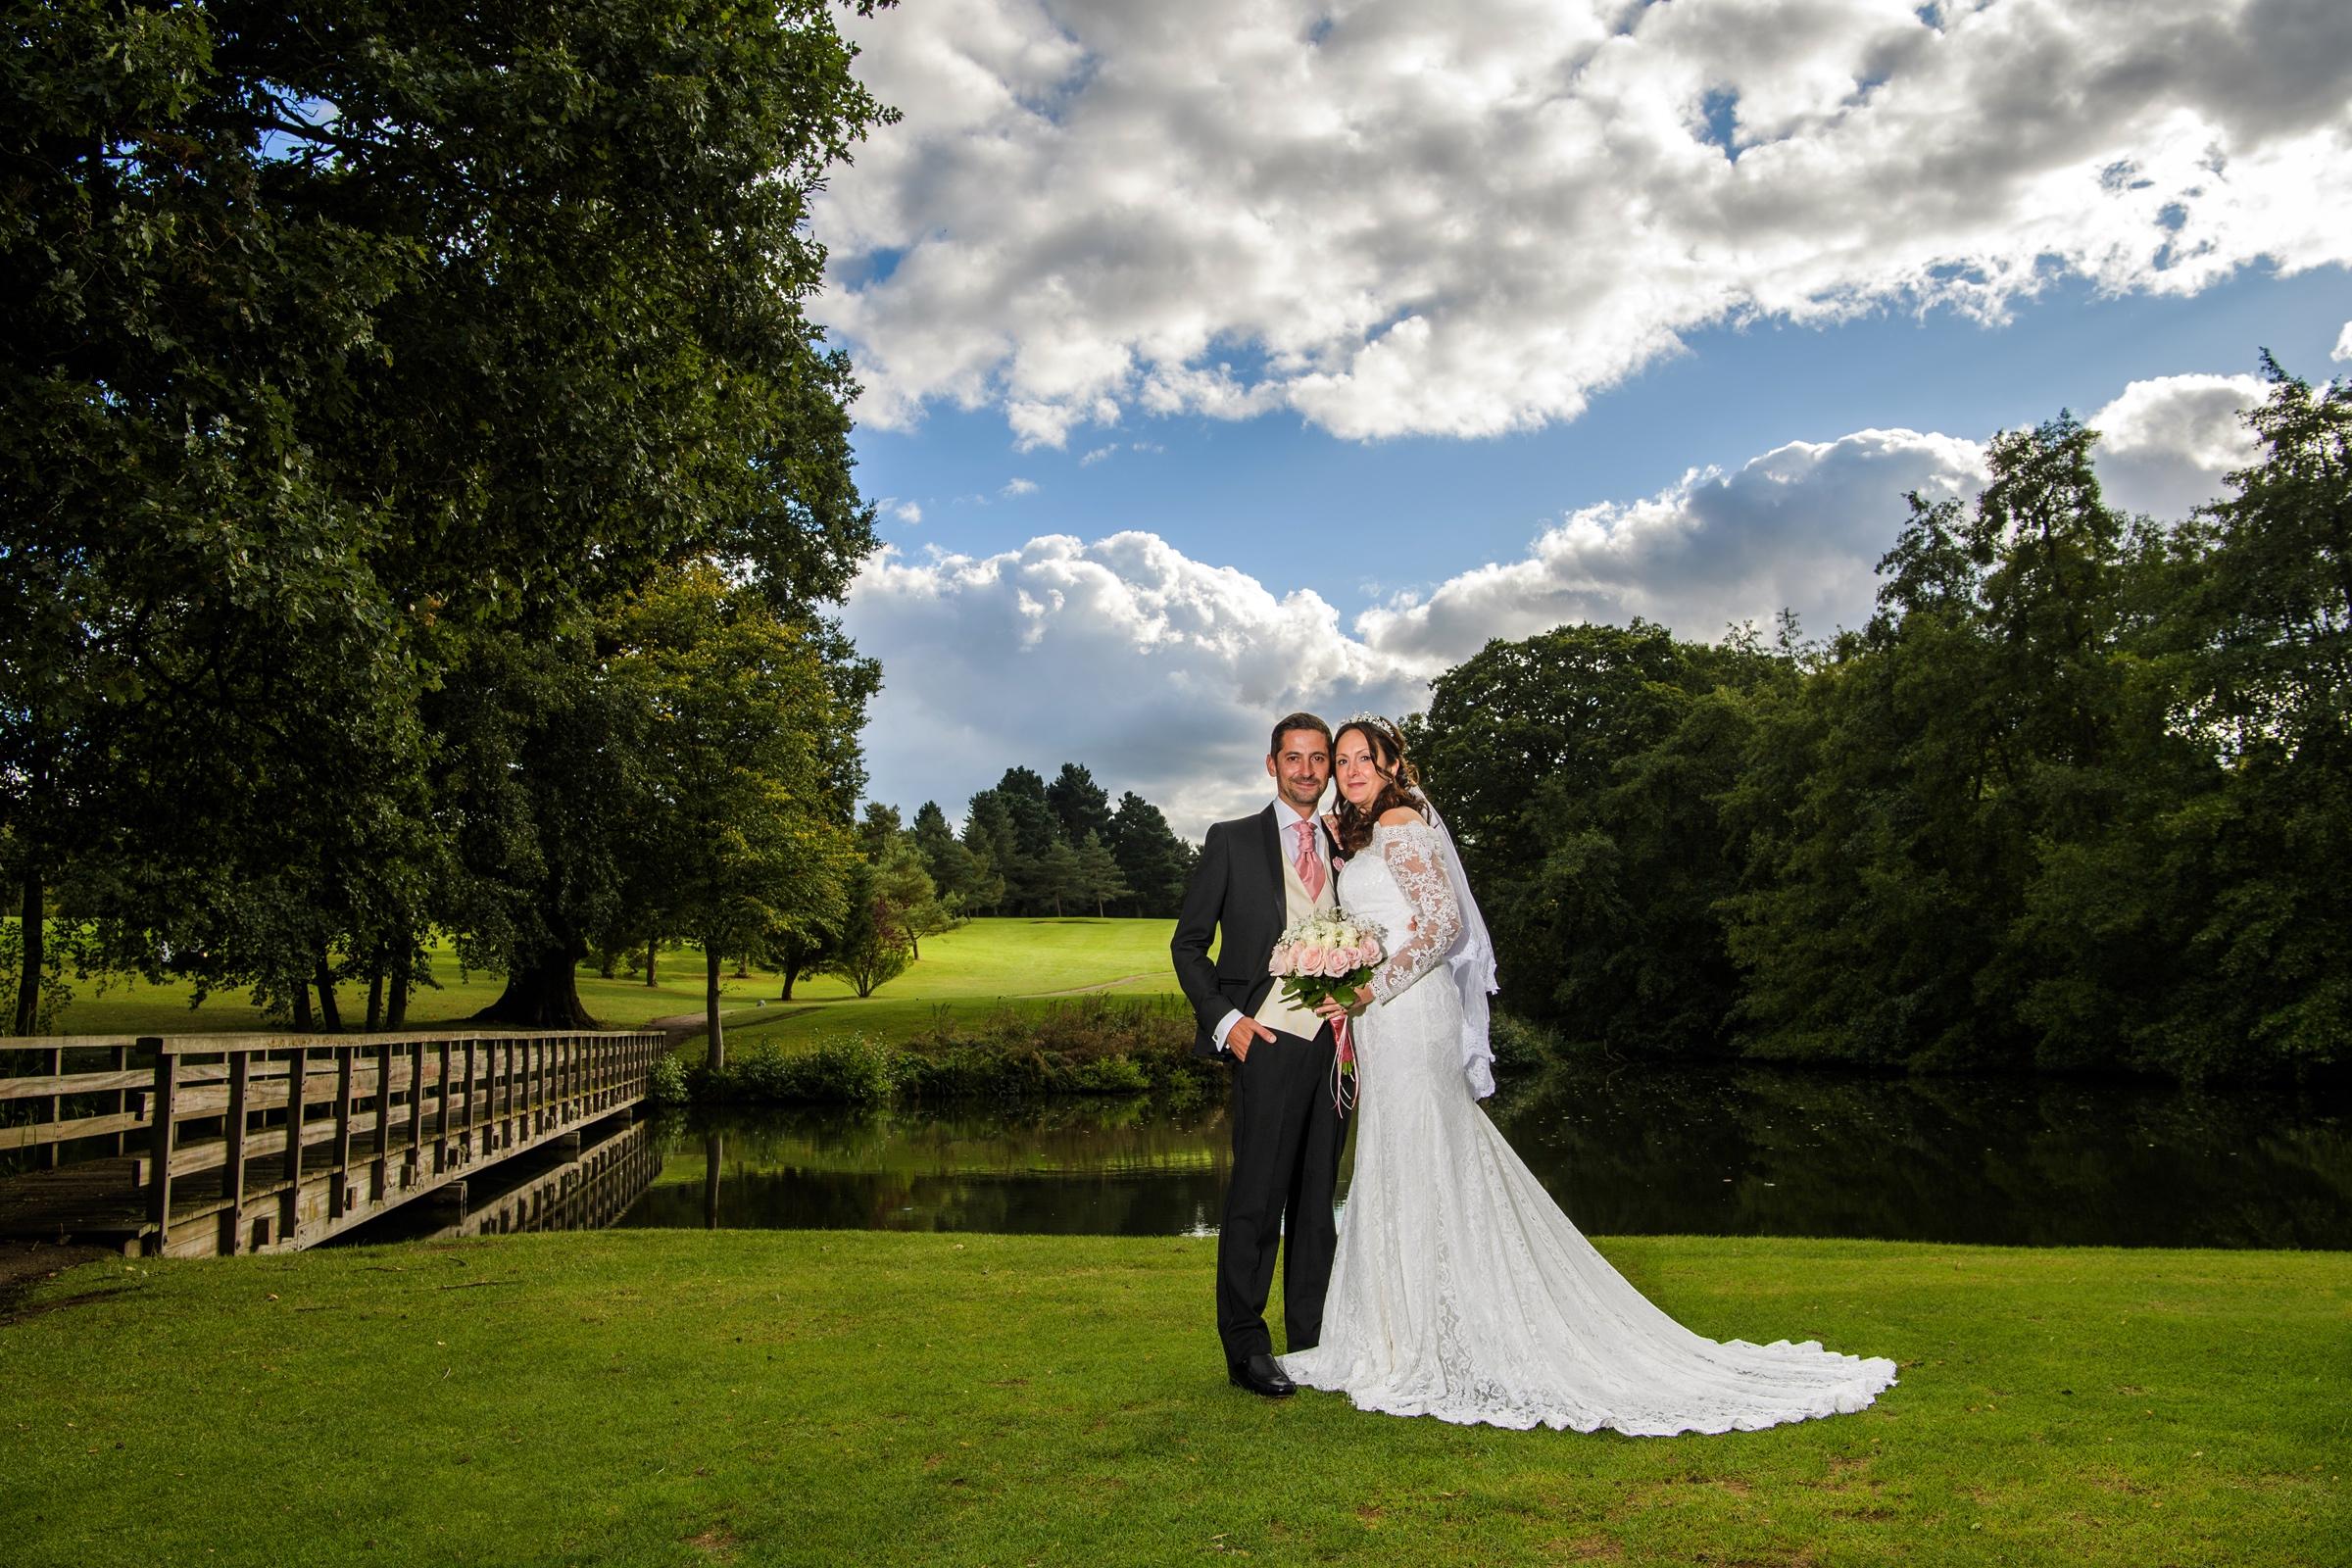 Weddings at Essendon CC